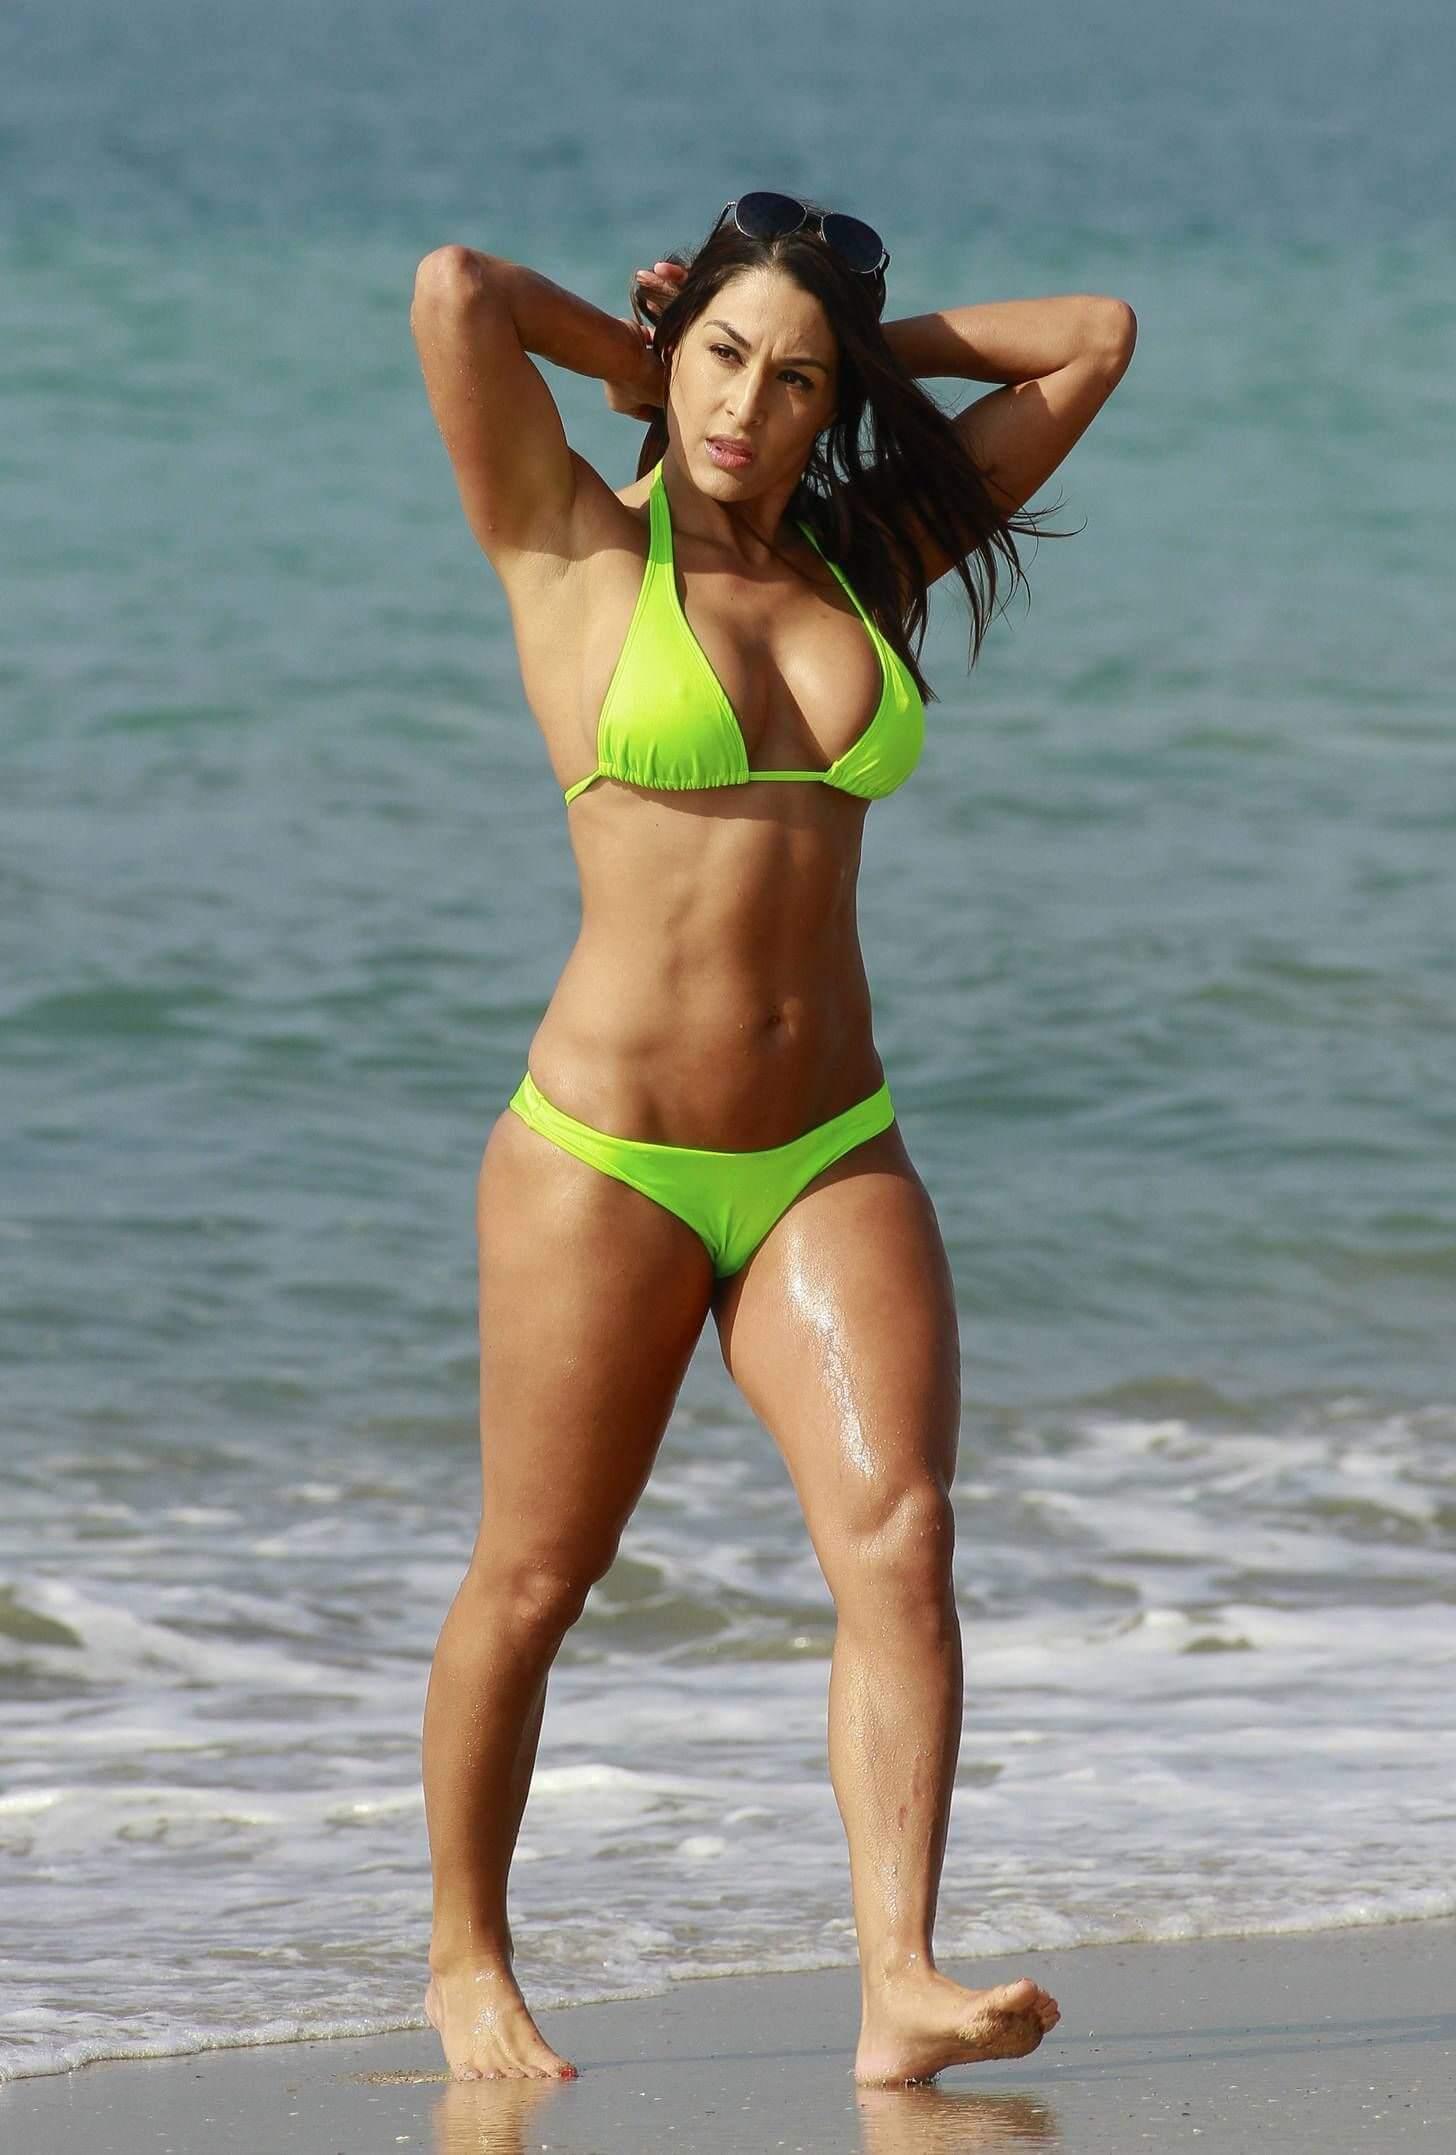 Brie Bella amazing tits pics